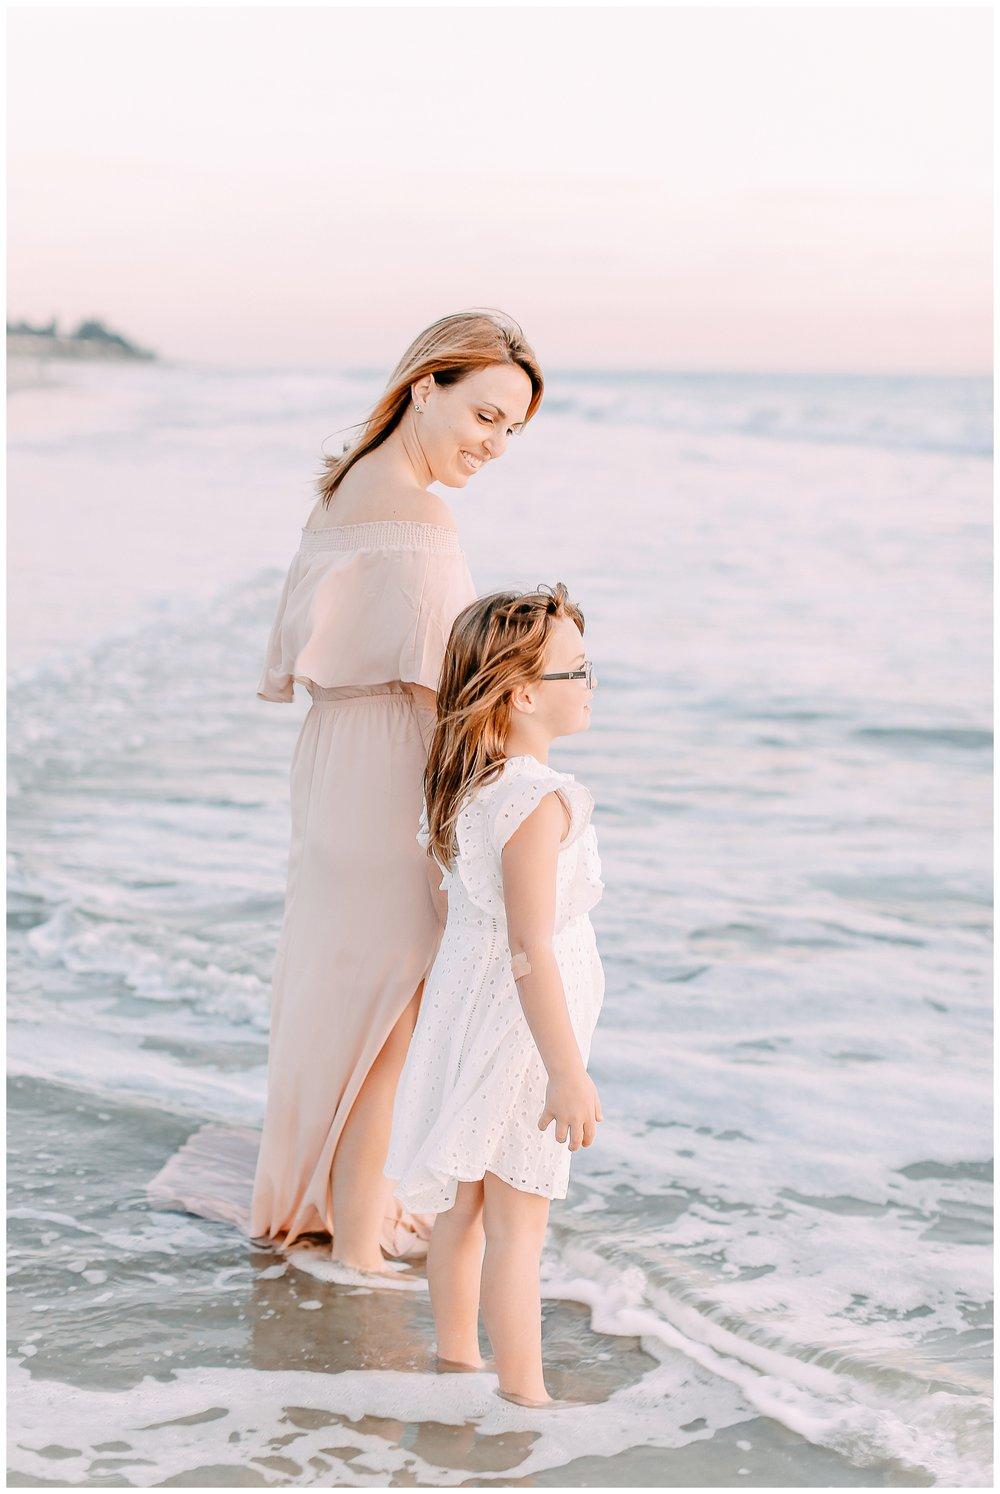 San_clemente_family_session_Orange_county_family_photographer_cori_kleckner_photography_laguna_beach_family_session_0711.jpg